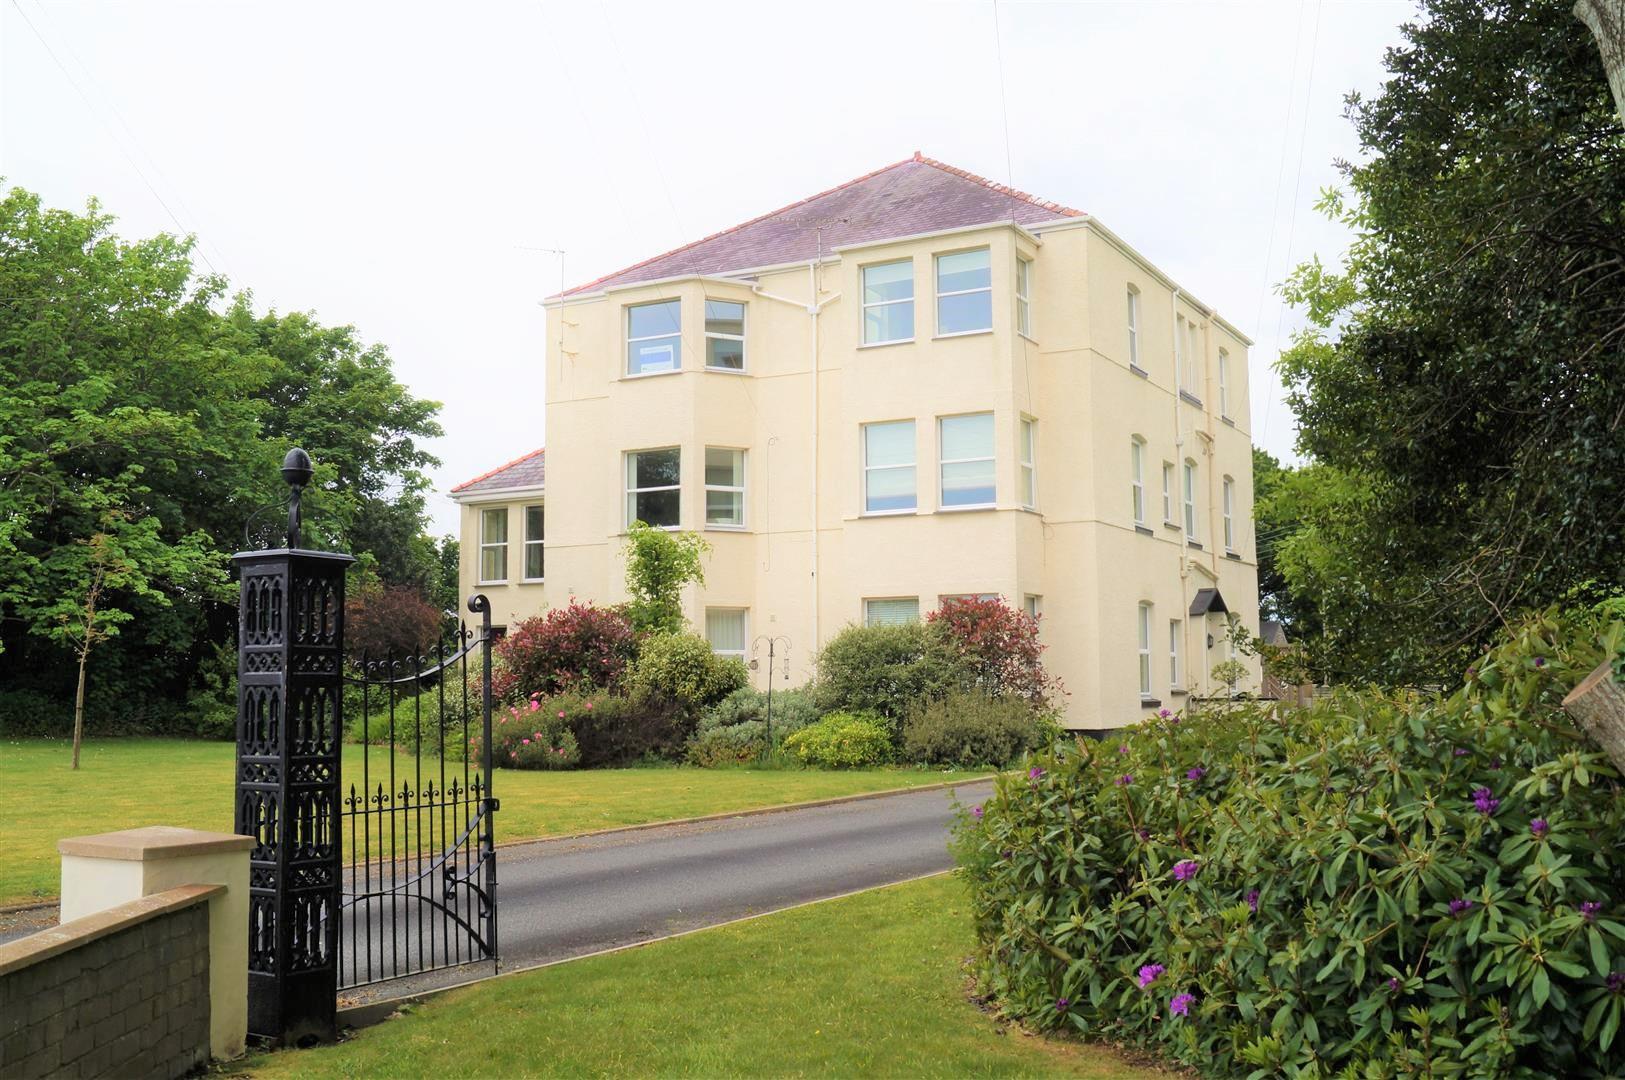 Talcymerau Road, Pwllheli - £139,000/Or nearest offer